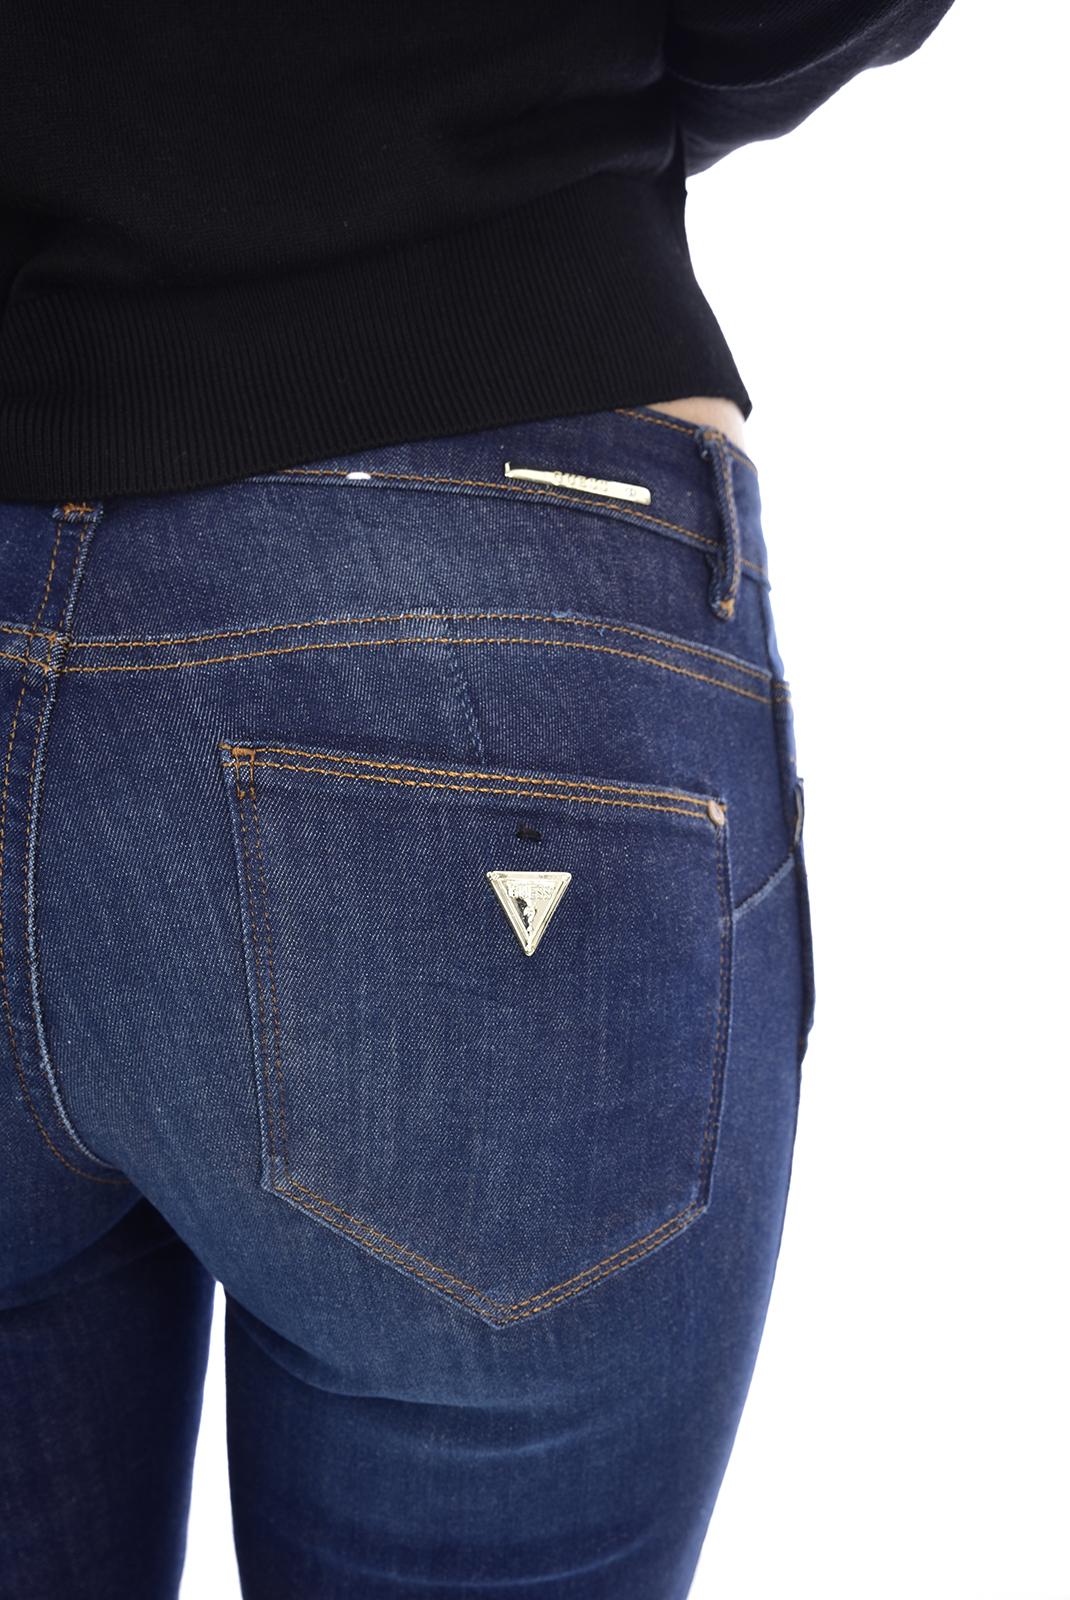 Jeans   Guess jeans W93AJ2 D3BP3 SDEE SEA DEEP